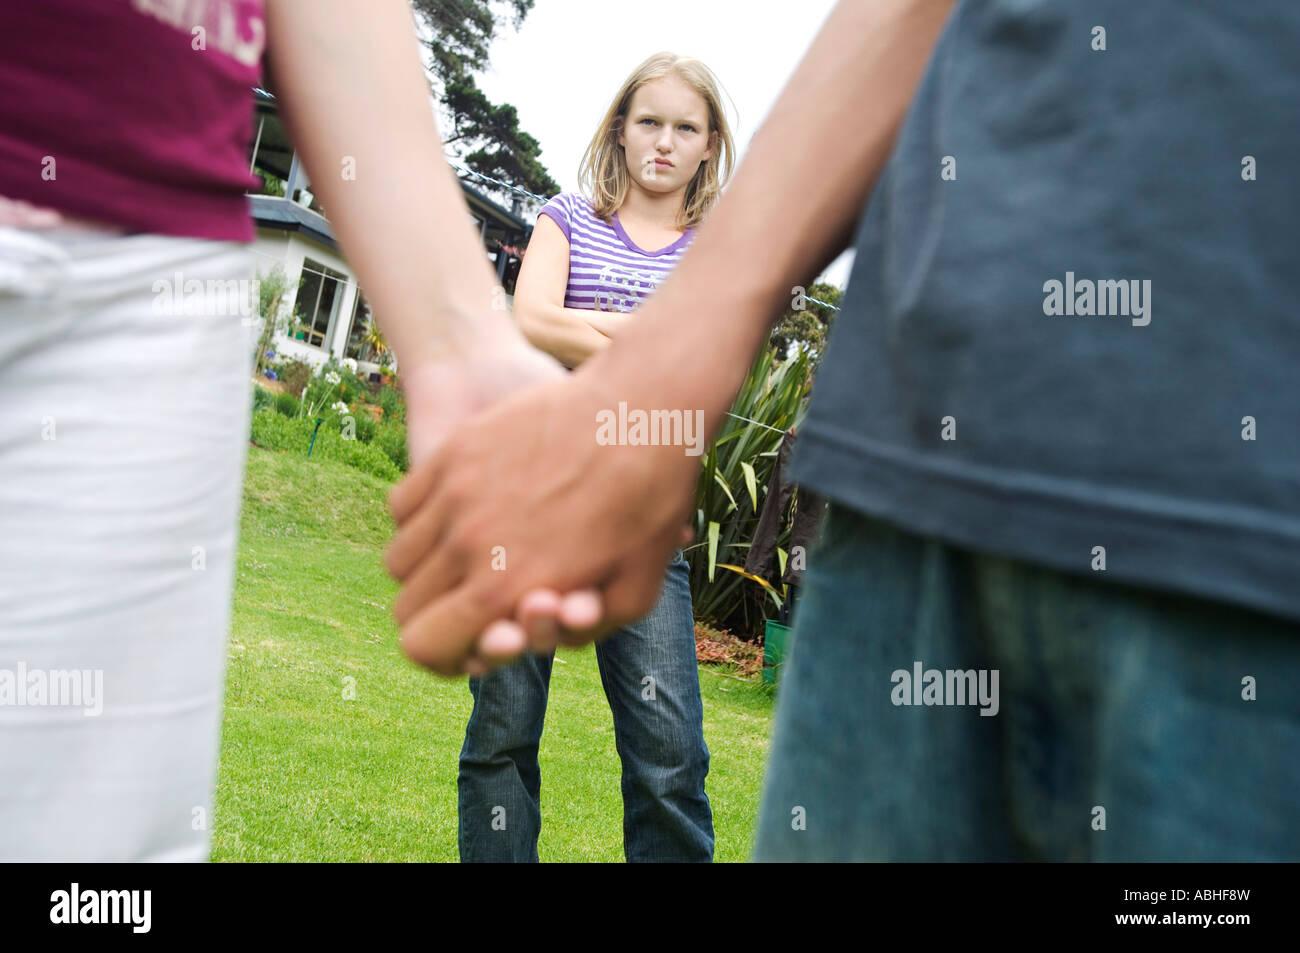 Hands holding teen